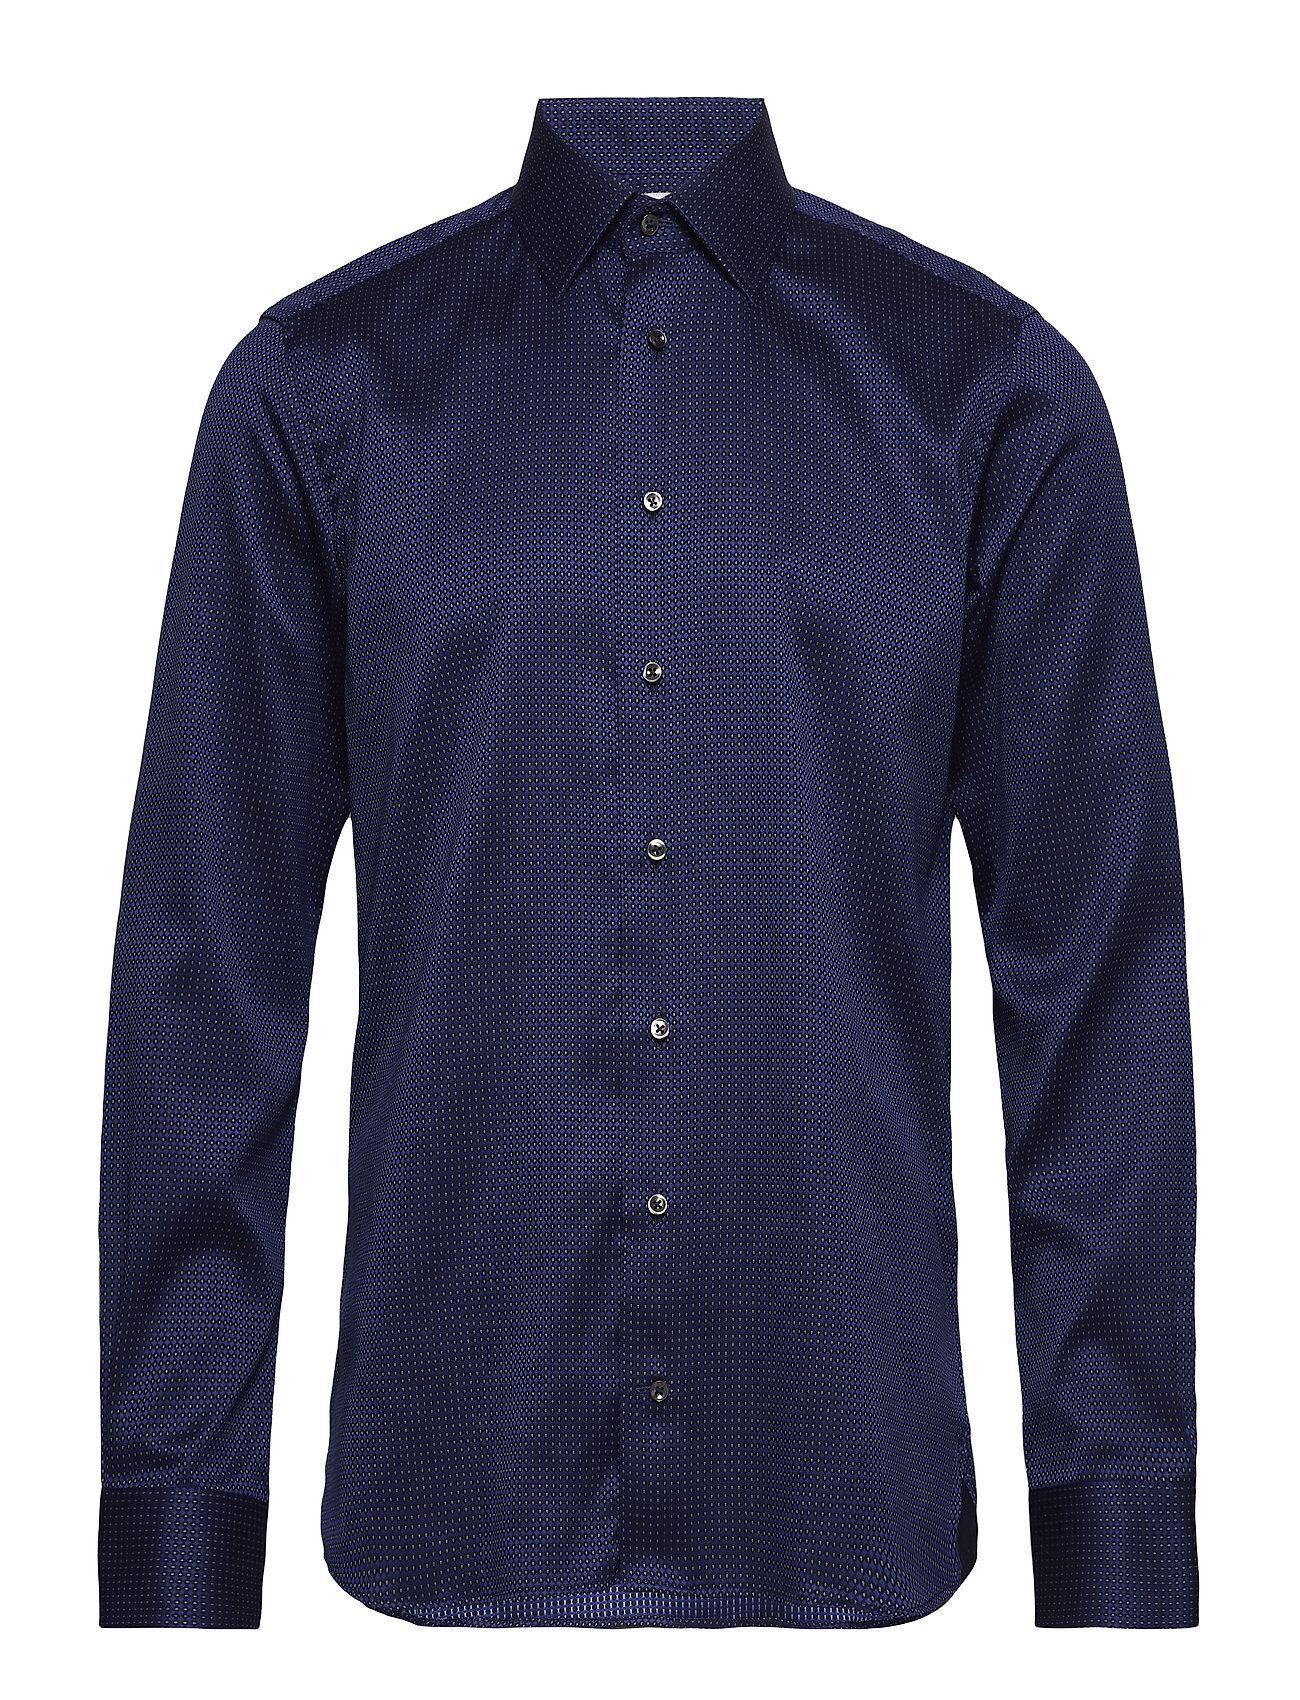 XO Shirtmaker by Sand Copenhagen 8053 - Gordon Sc